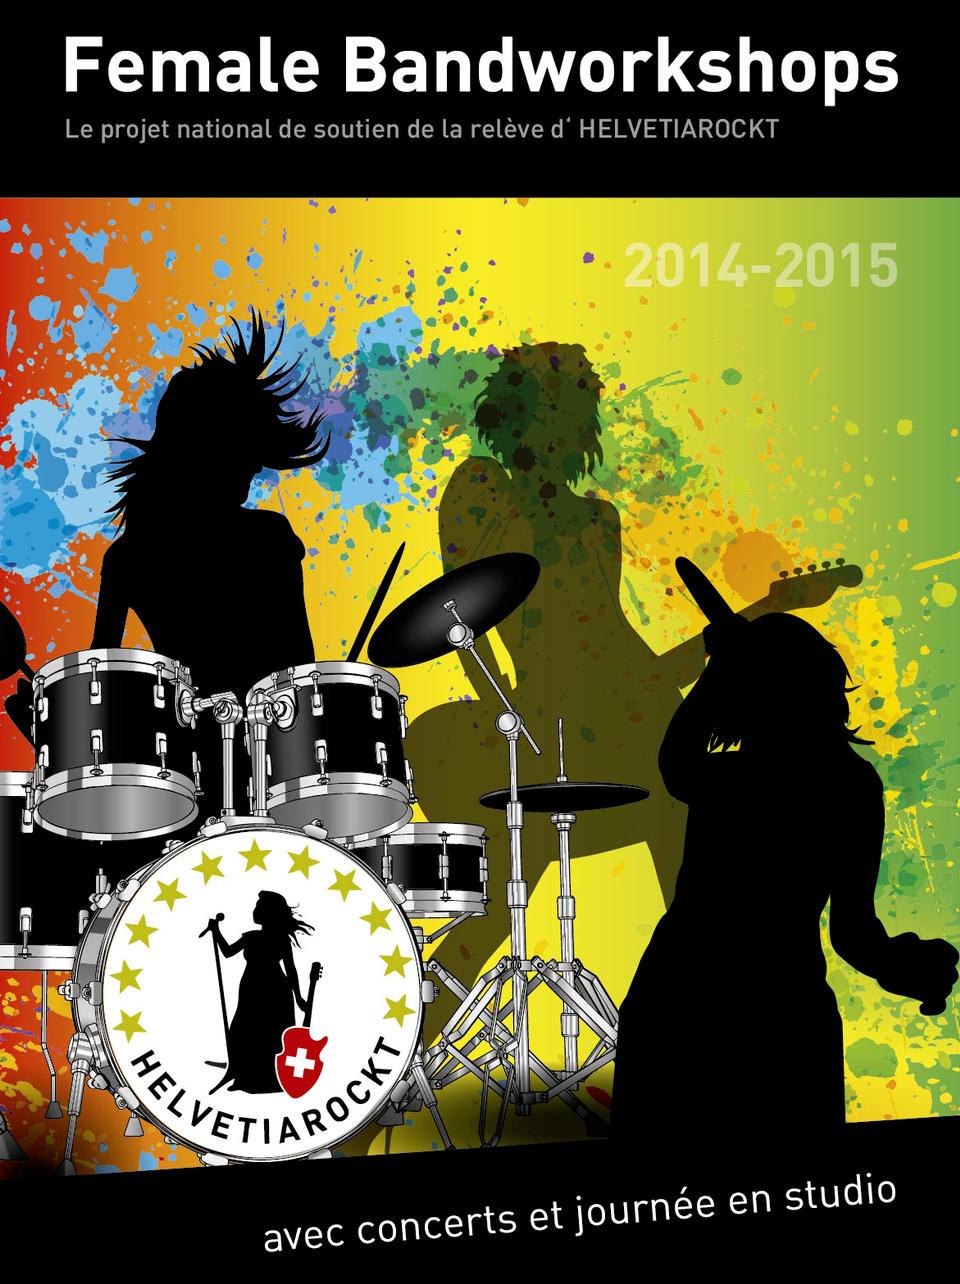 Female Bandworkshops. [RTS]